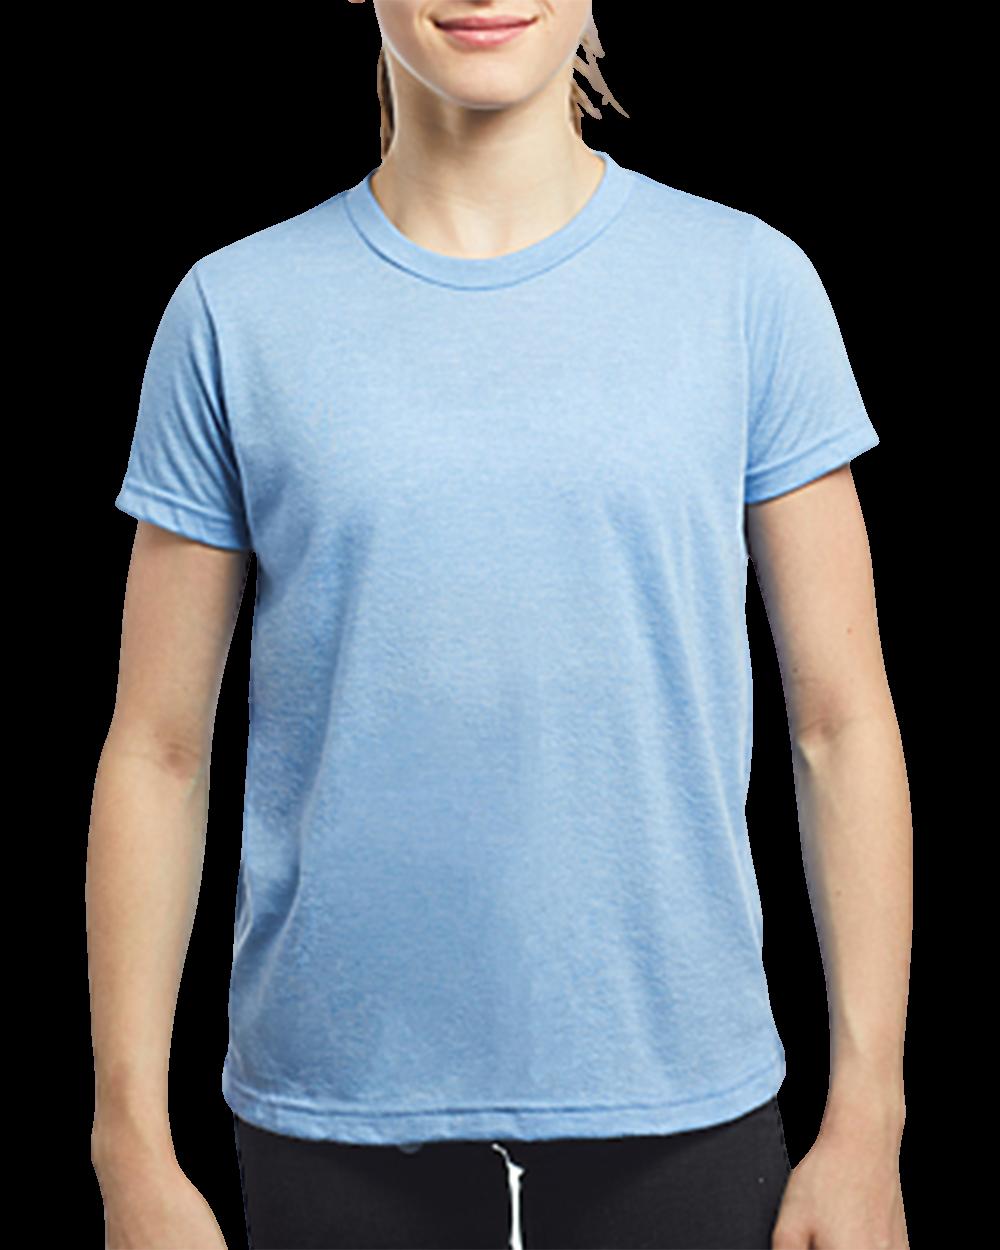 Youth Fine Blend T-Shirt